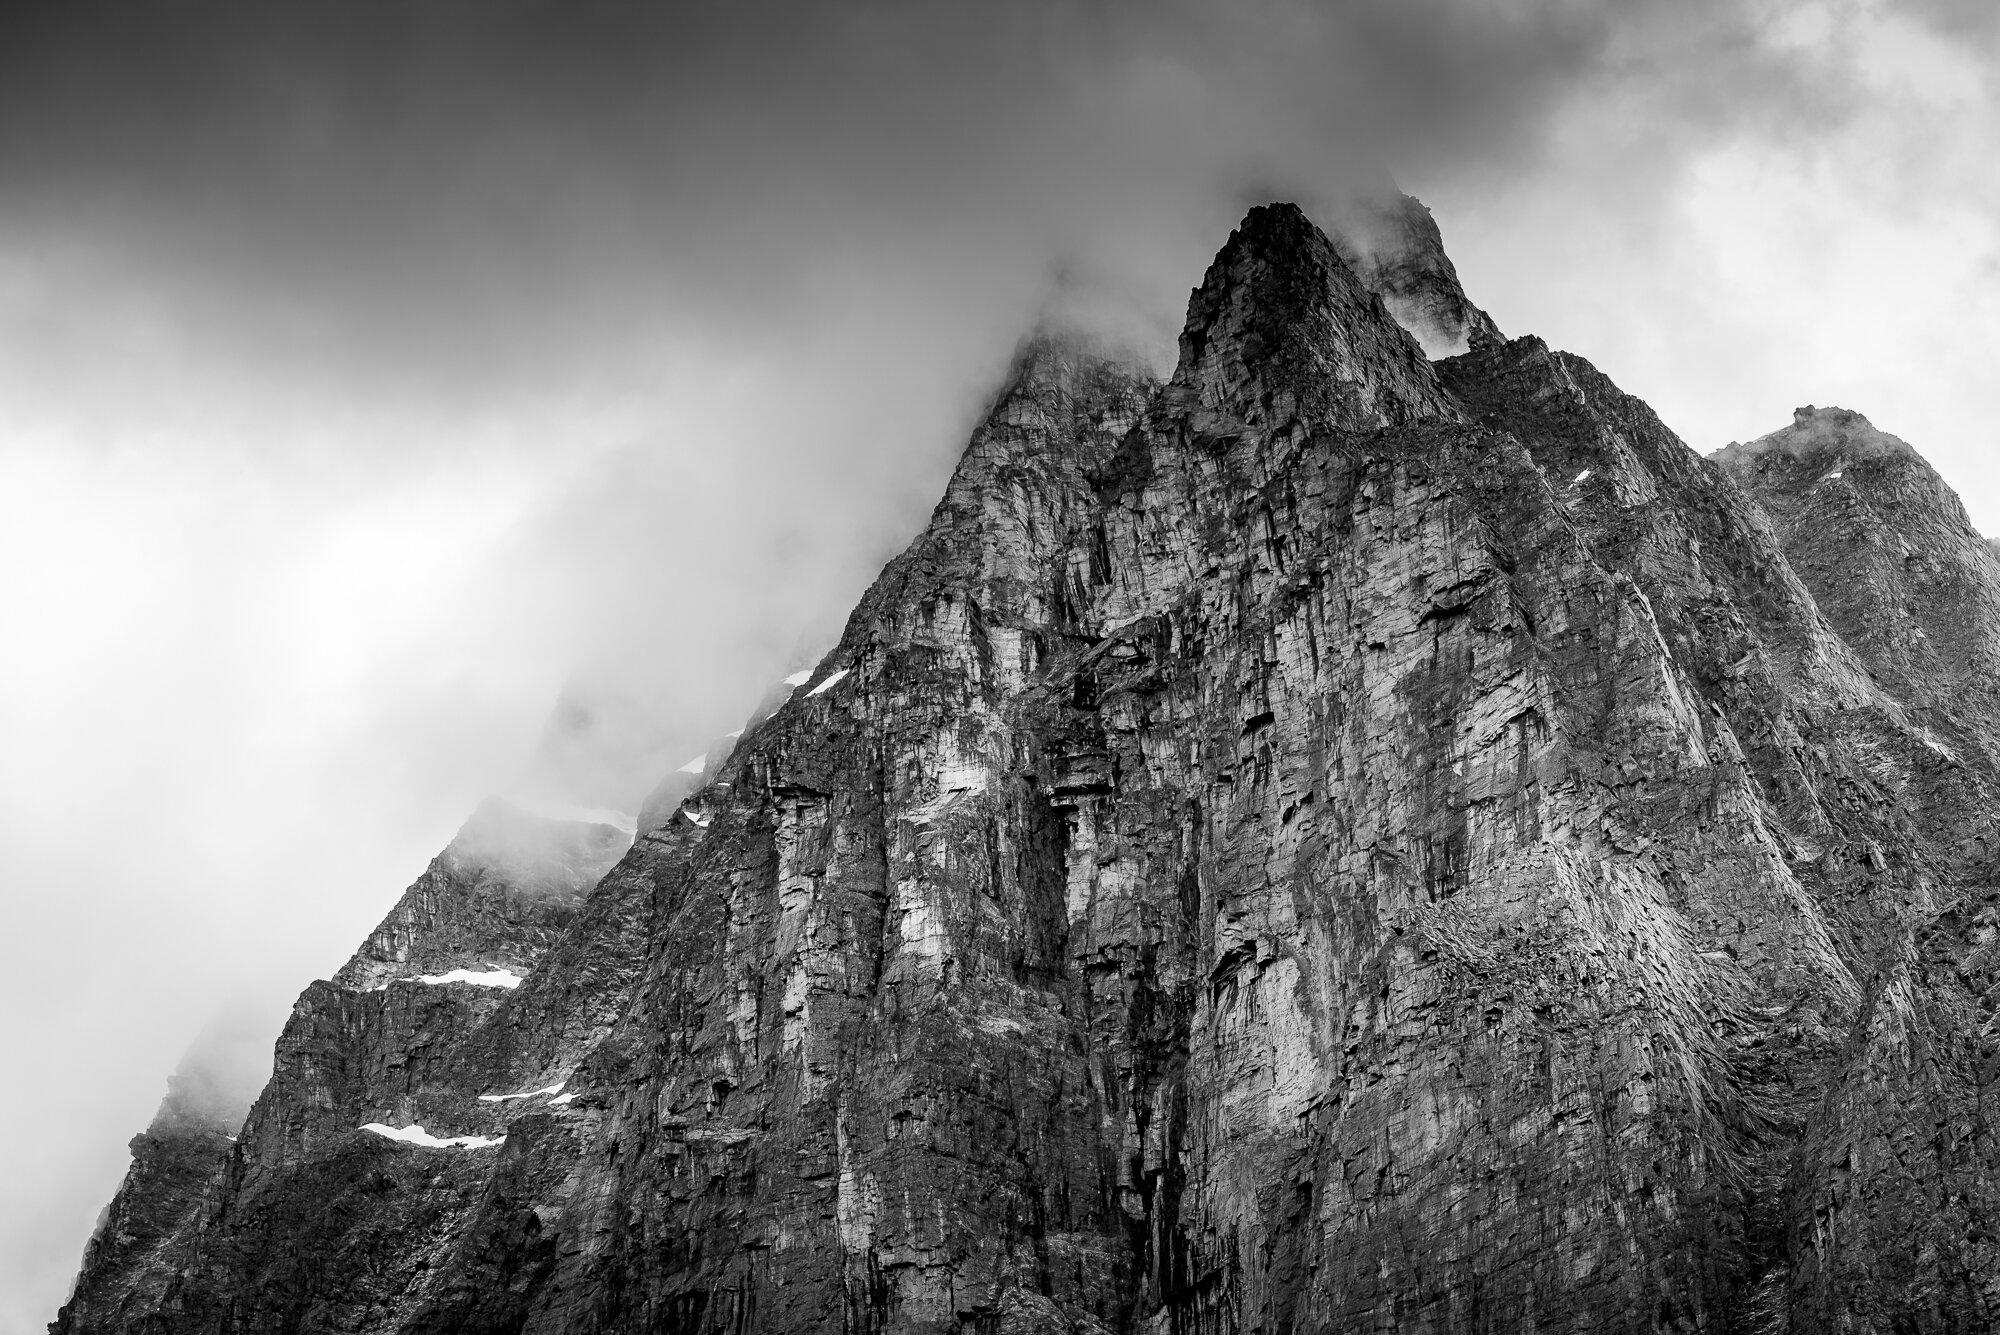 British Columbia Mountains: 'Jagged Edges'